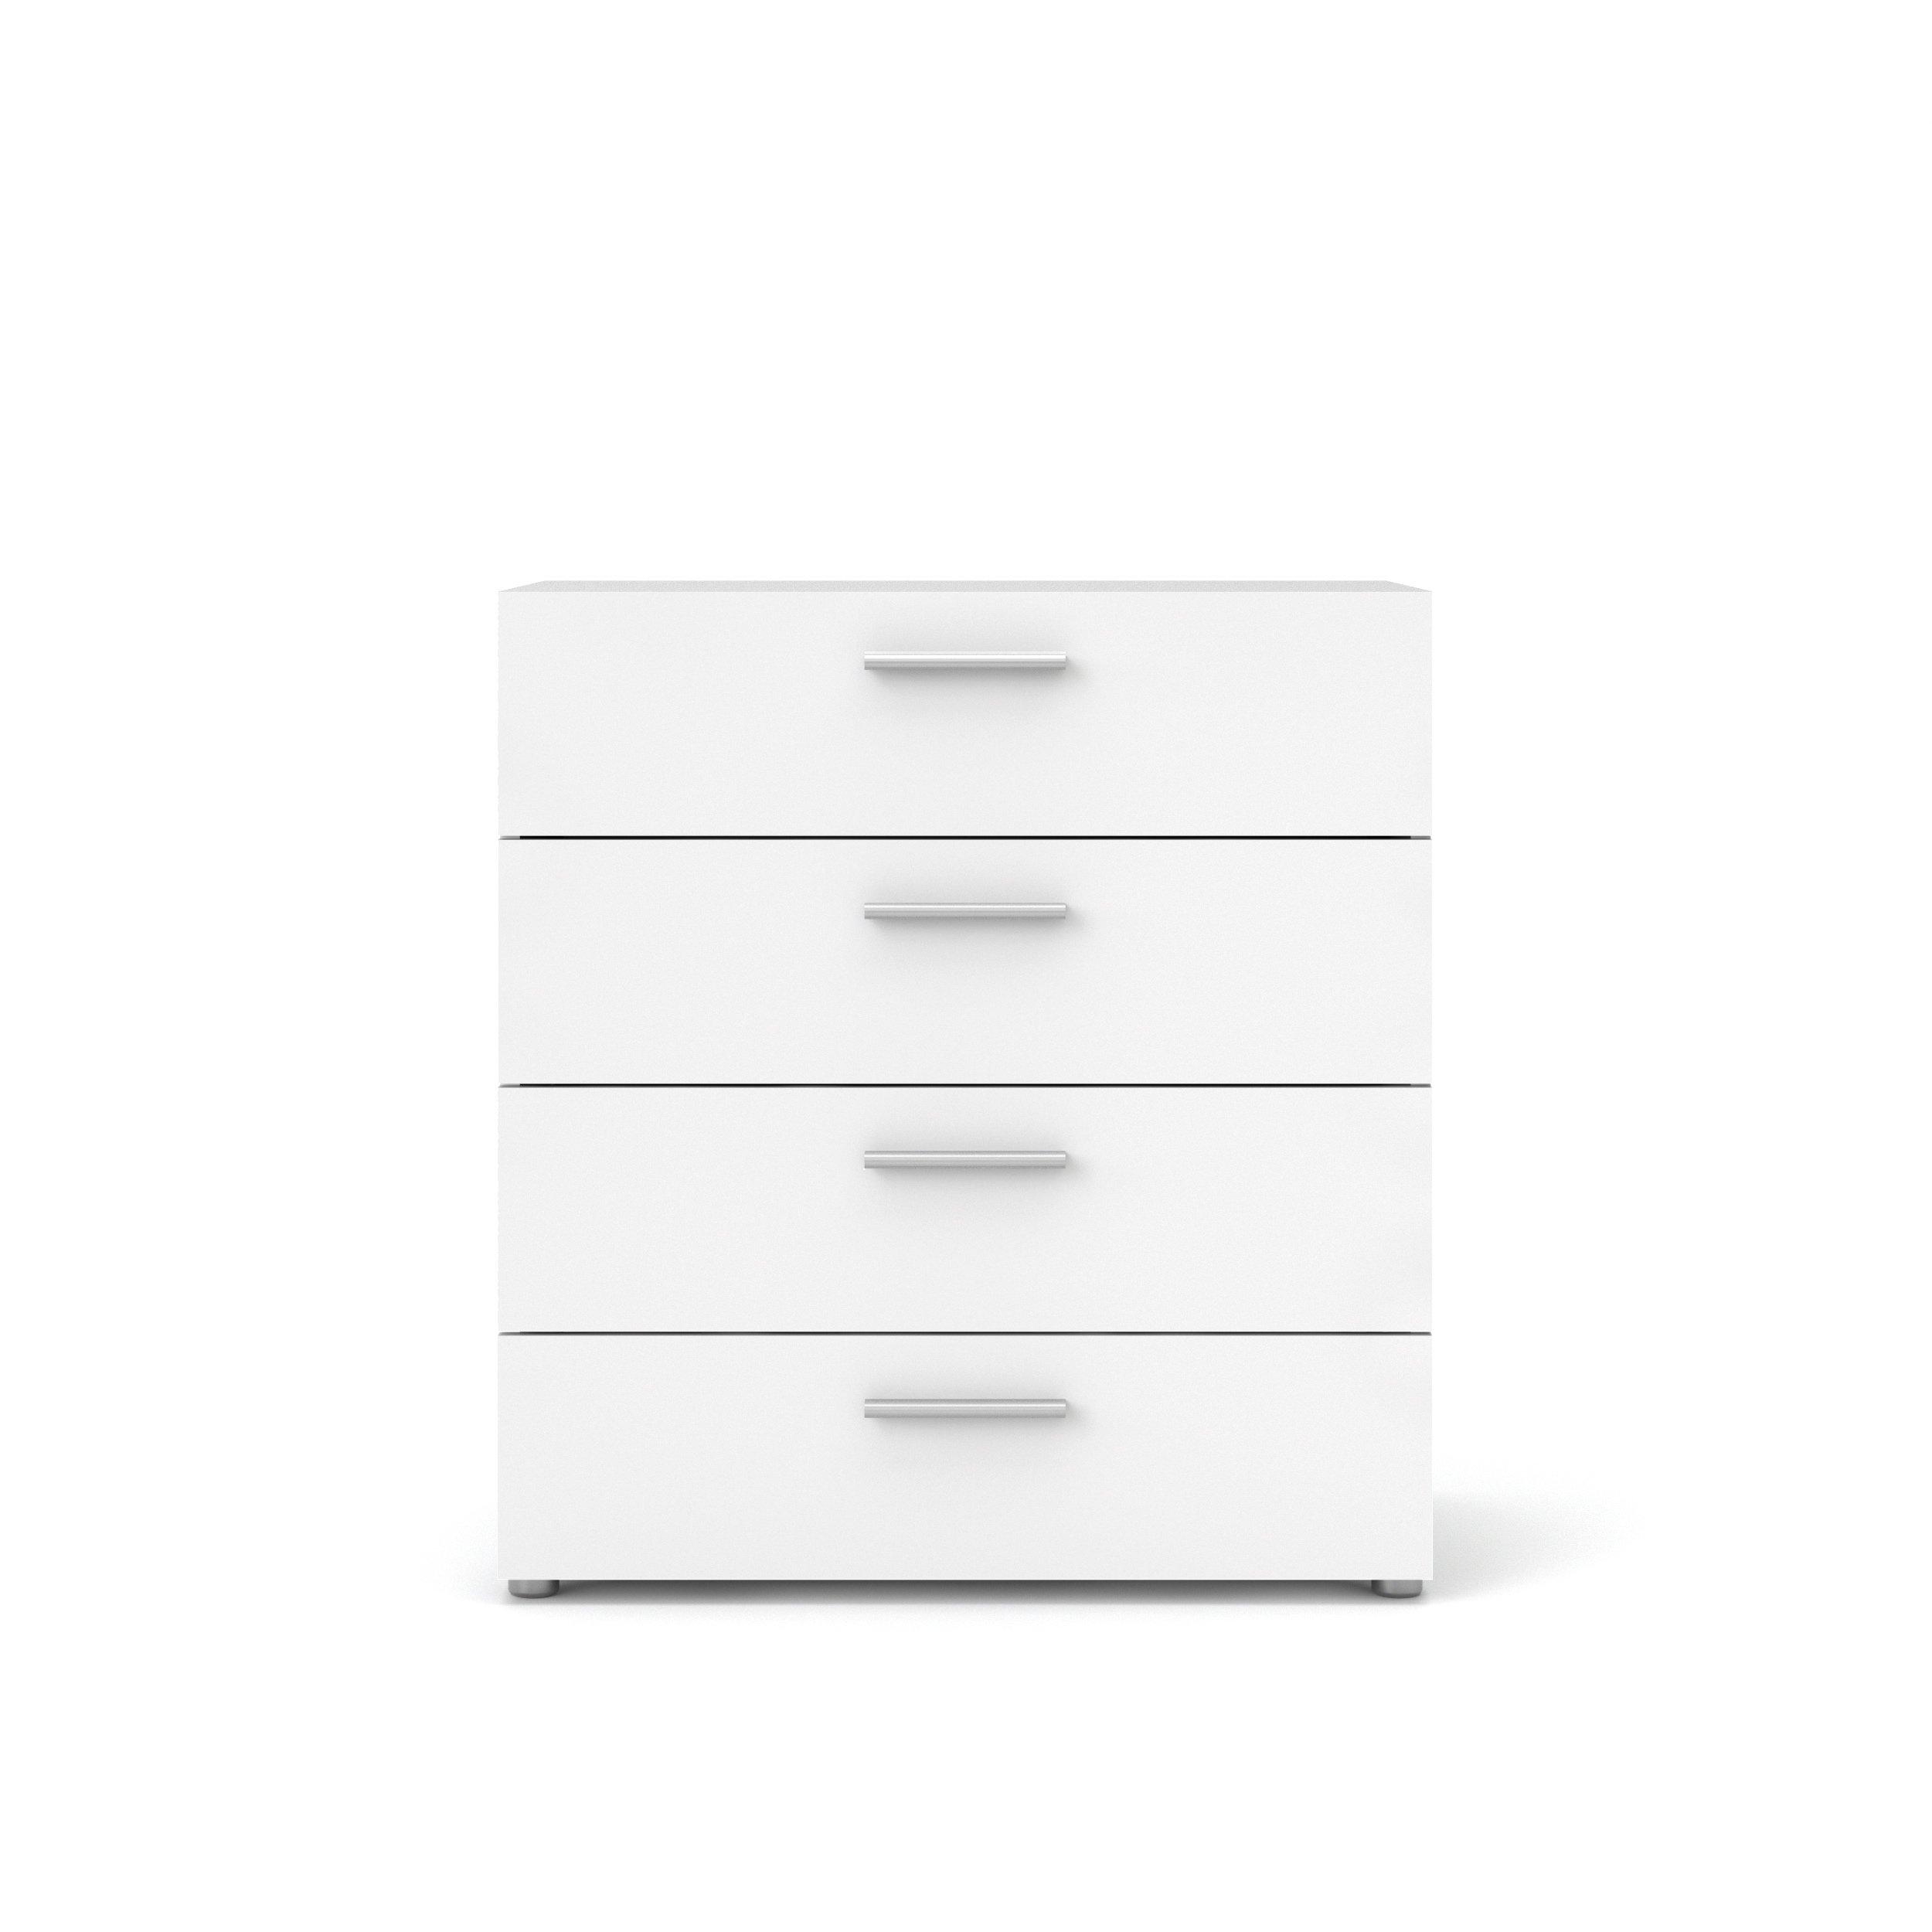 Tvilum 705054949 Austin 4 Drawer Chest, White by Tvilum